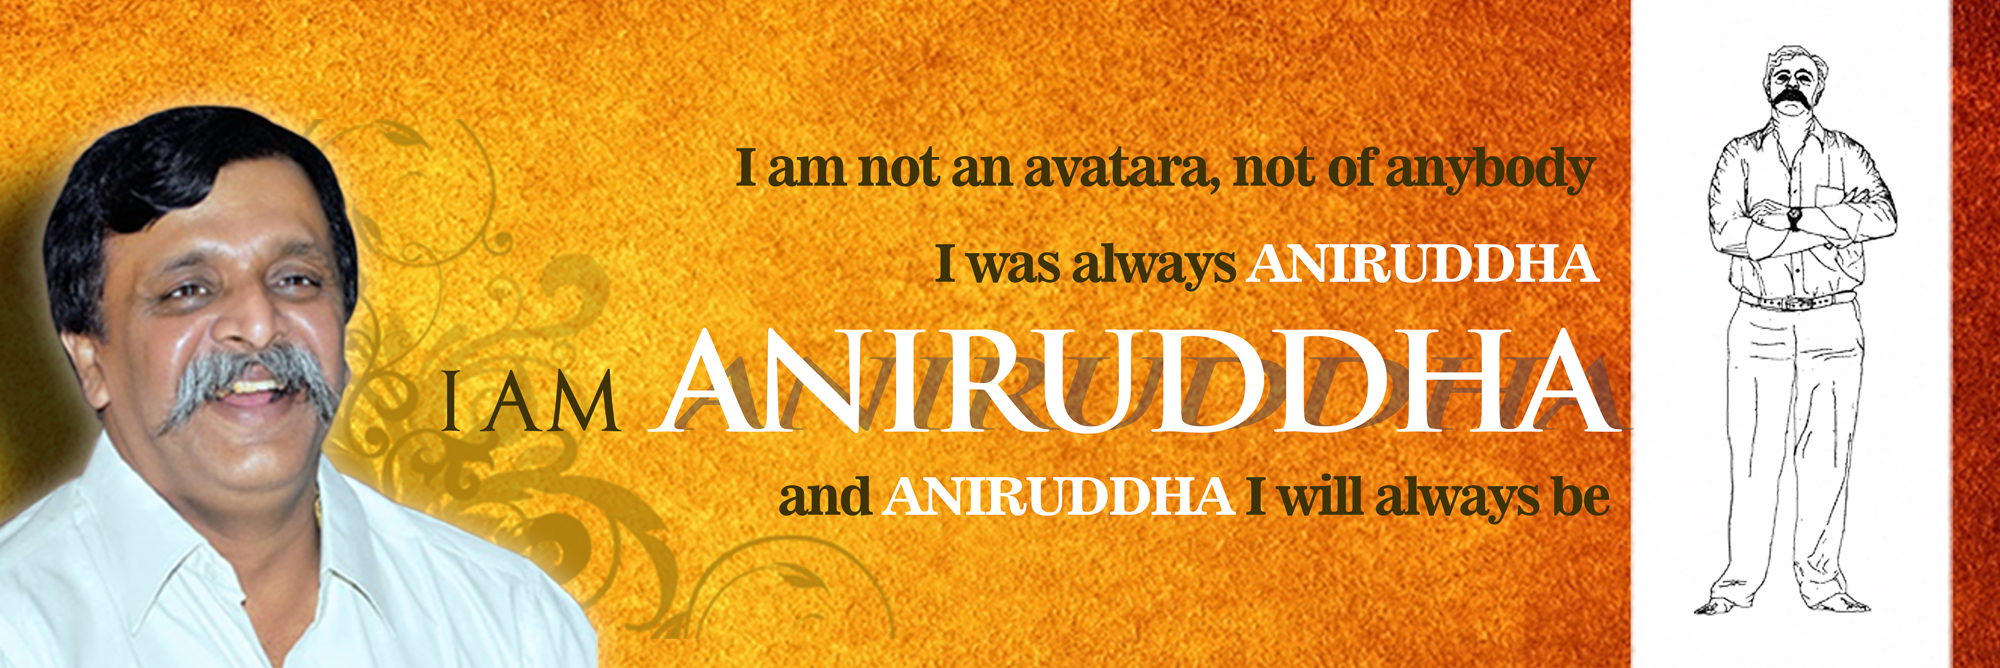 AniruddhaFoundation-I am Aniruddha